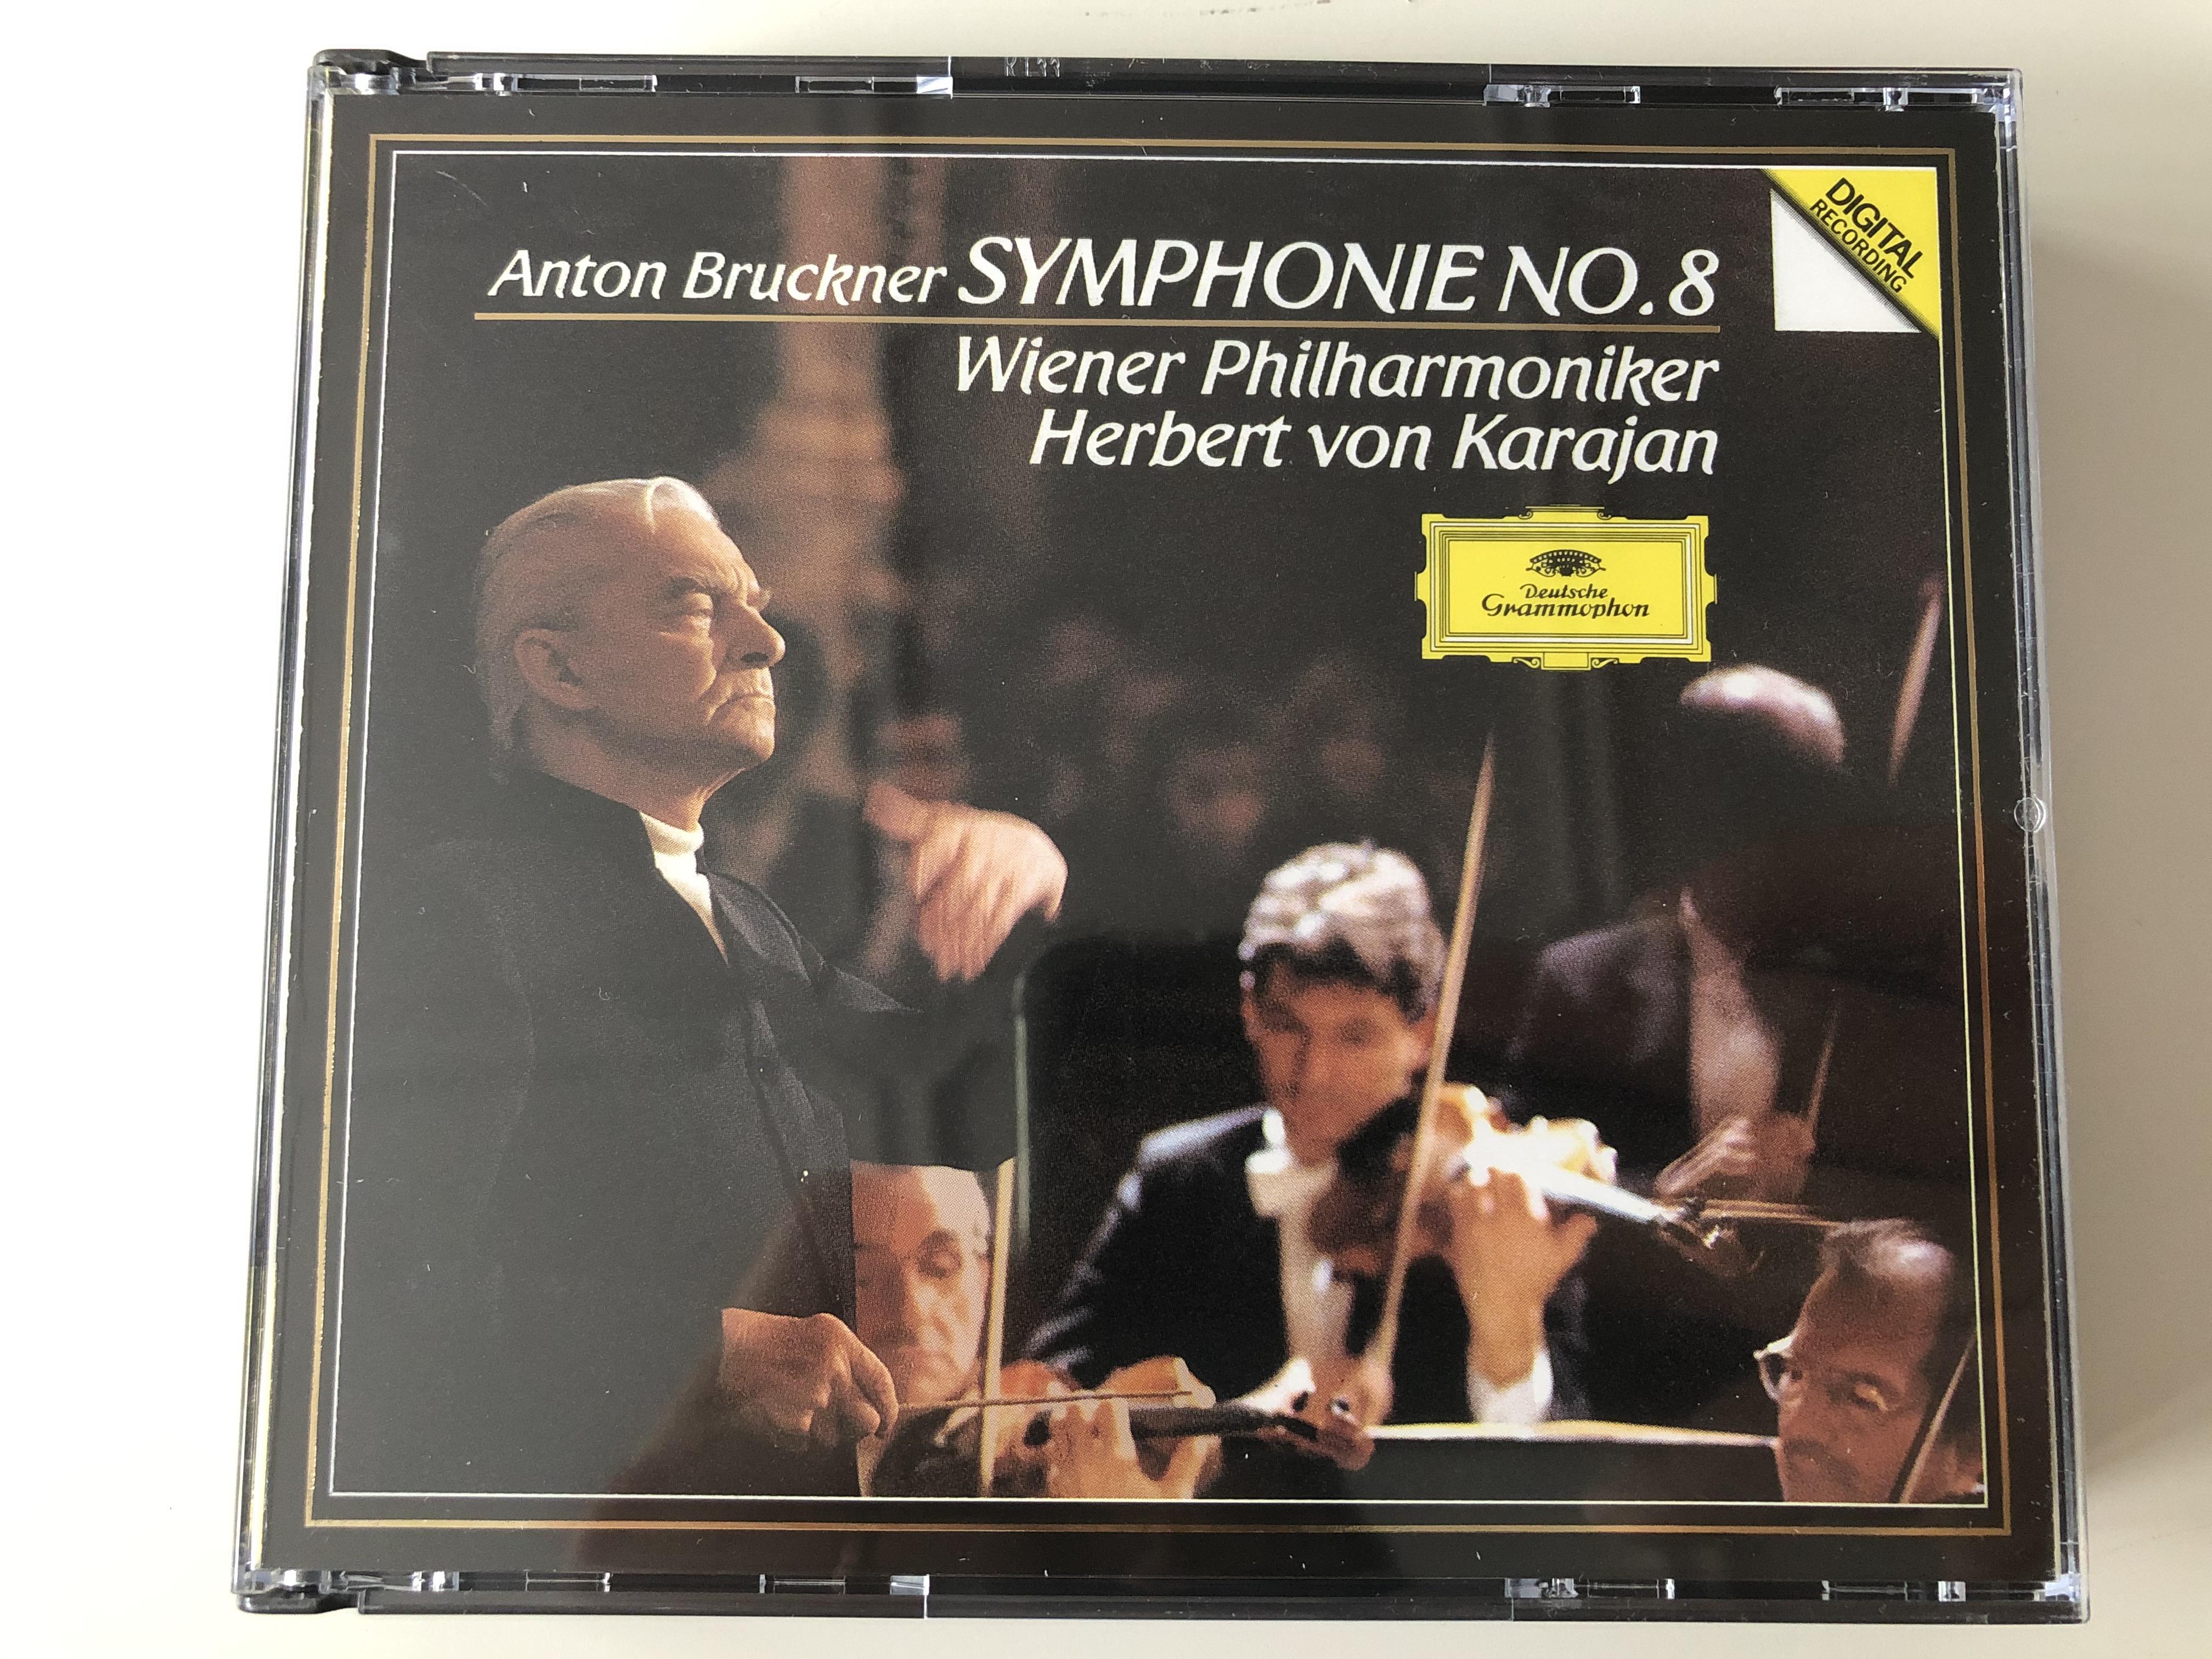 anton-bruckner-symphonie-no.-8-wiener-philharmoniker-herbert-von-karajan-deutsche-grammophon-2x-audio-cd-1989-stereo-427-611-2-1-.jpg